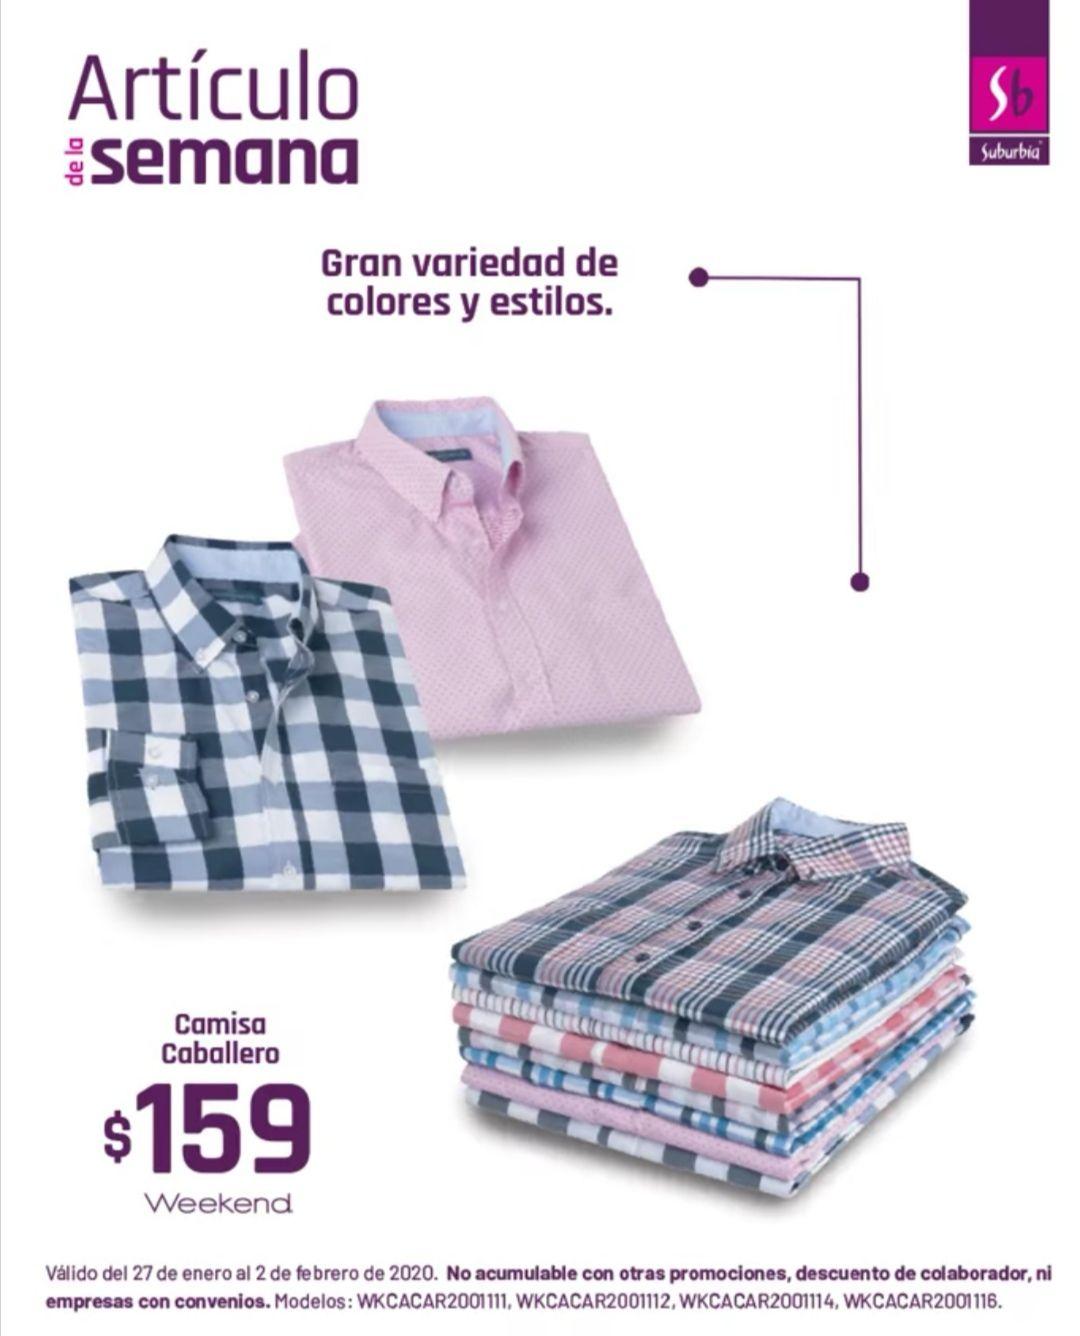 Suburbia: Camisa Caballero Weekend $159